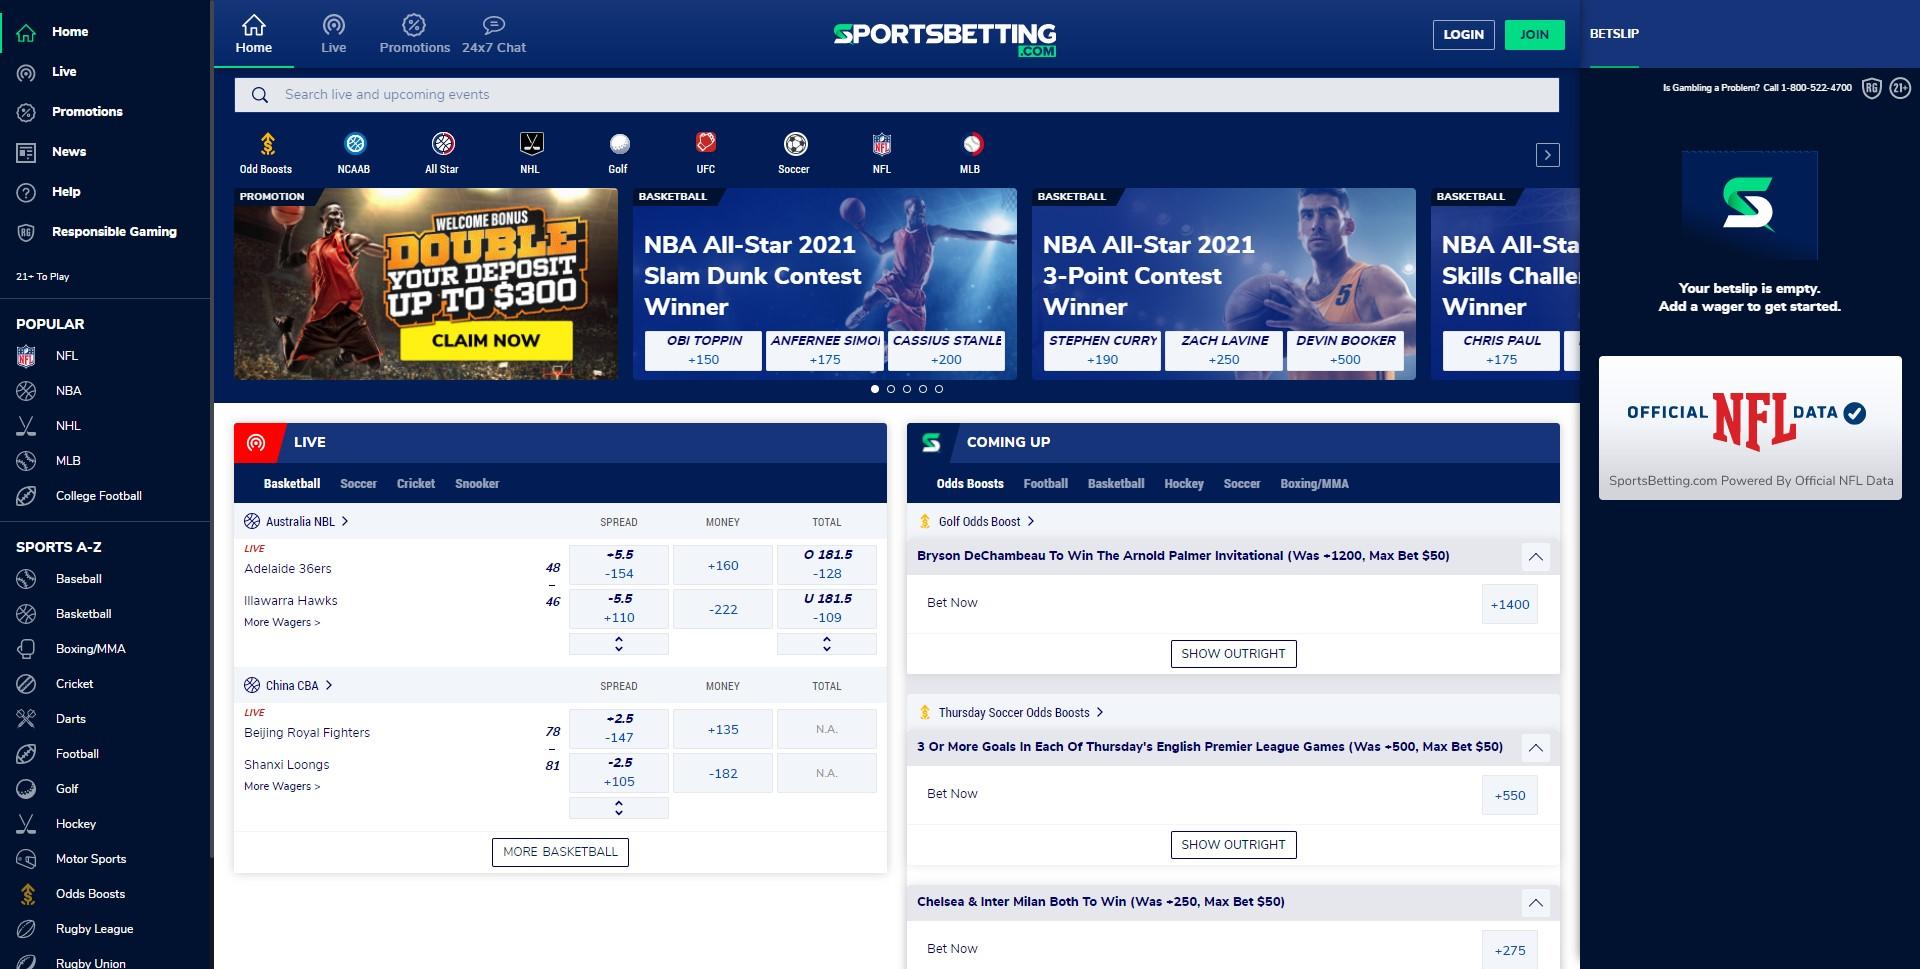 sportsbetting homepage